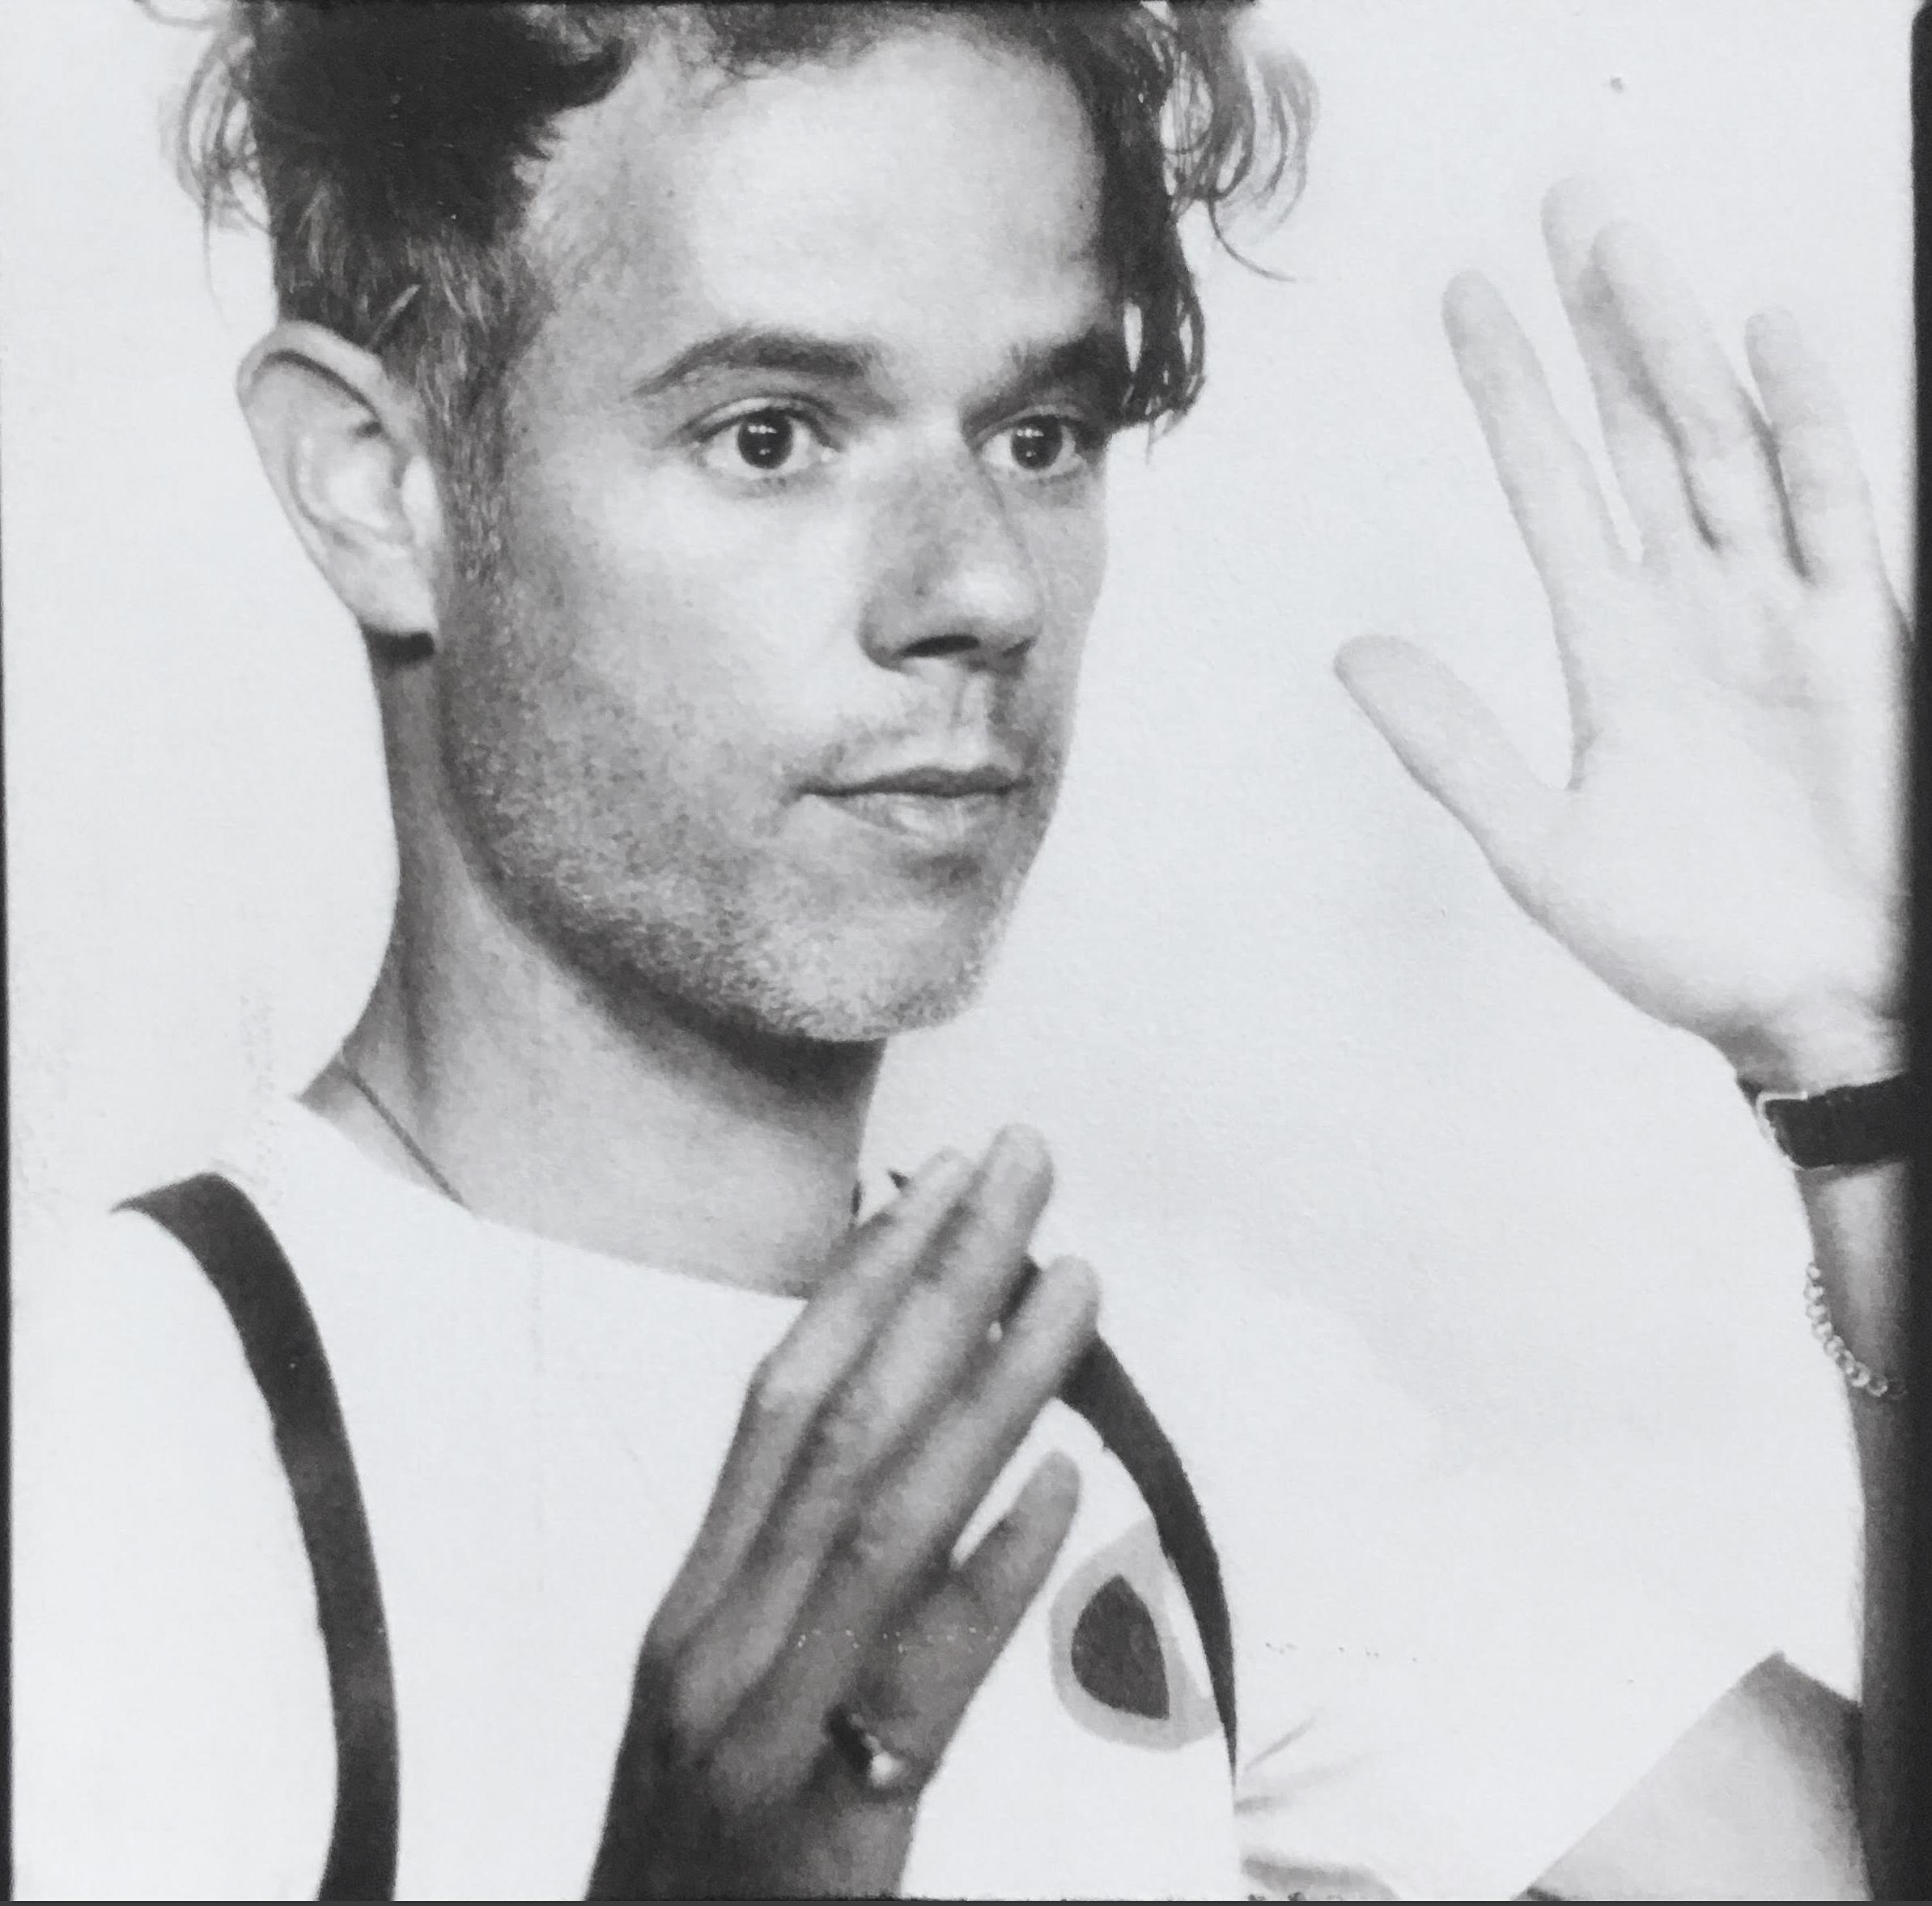 Daniel Llaneza